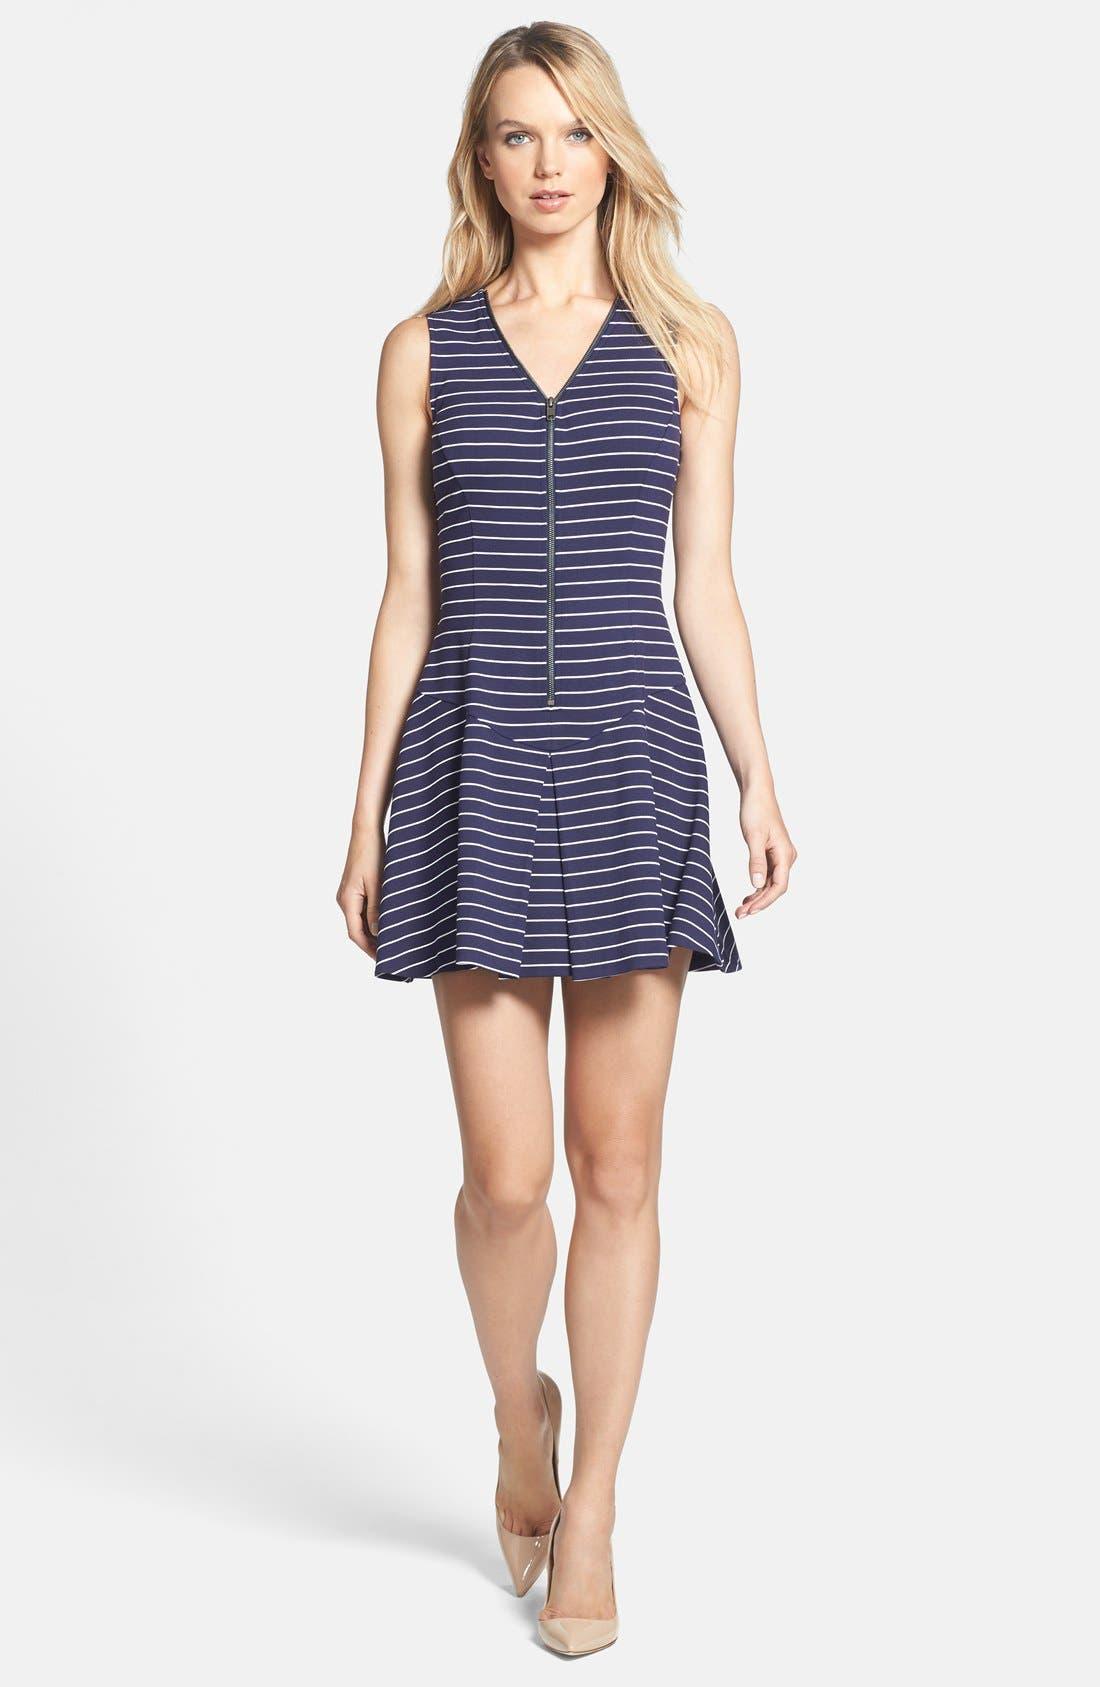 Main Image - Theory 'Sayidres' Knit Fit & Flare Dress